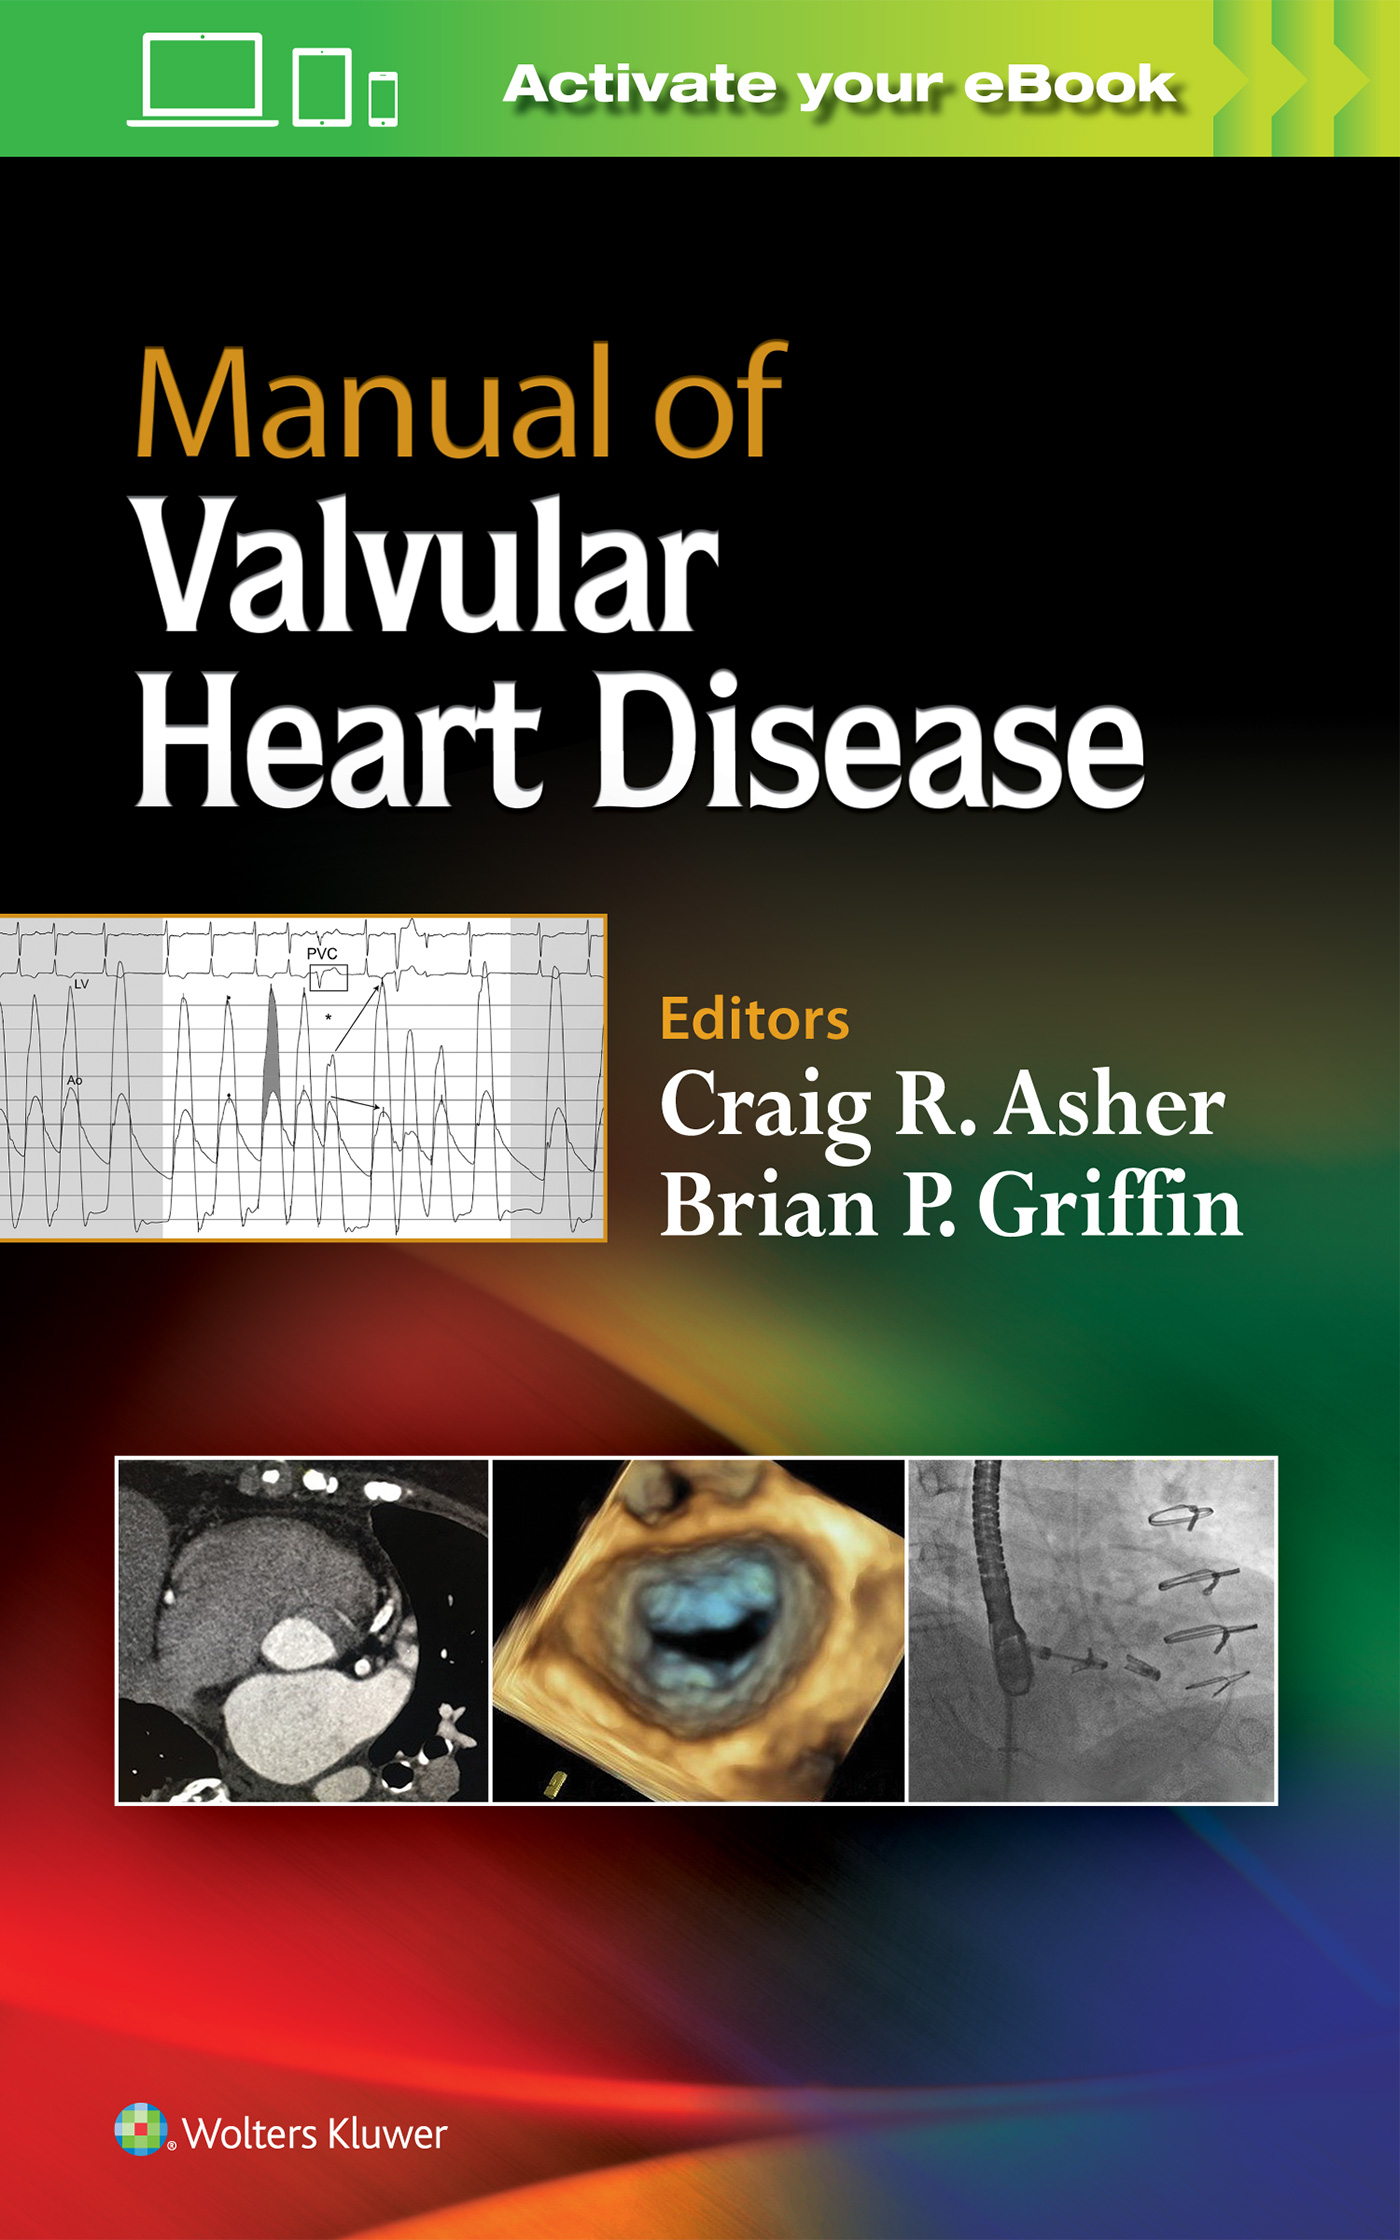 Rheumatic diseases and the heart ebook array manual of valvular heart disease rh shop lww com fandeluxe Images